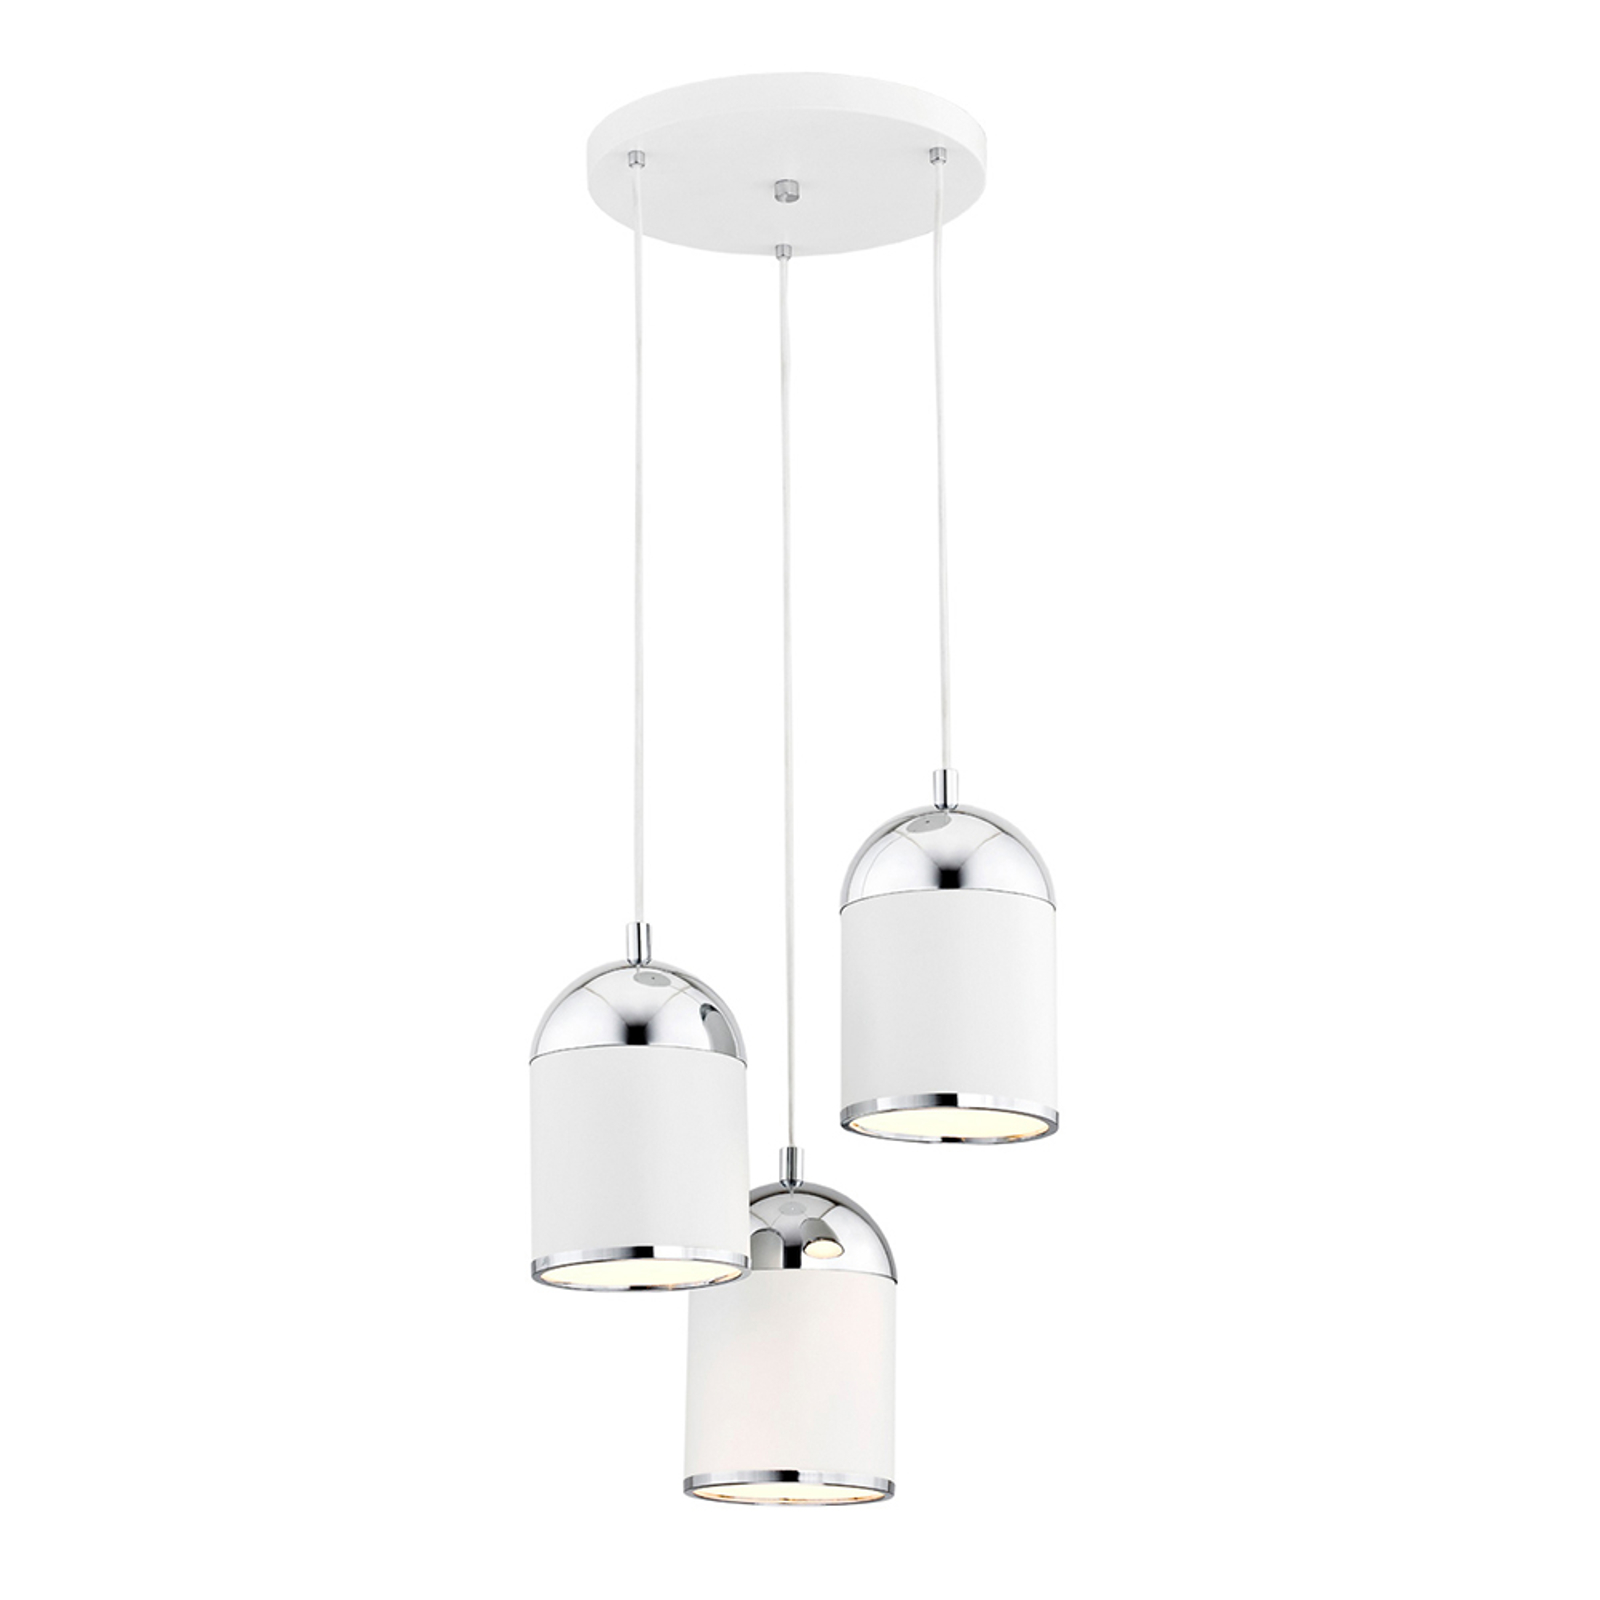 Suspension Anadia, à 3 lampes, ronde, blanche